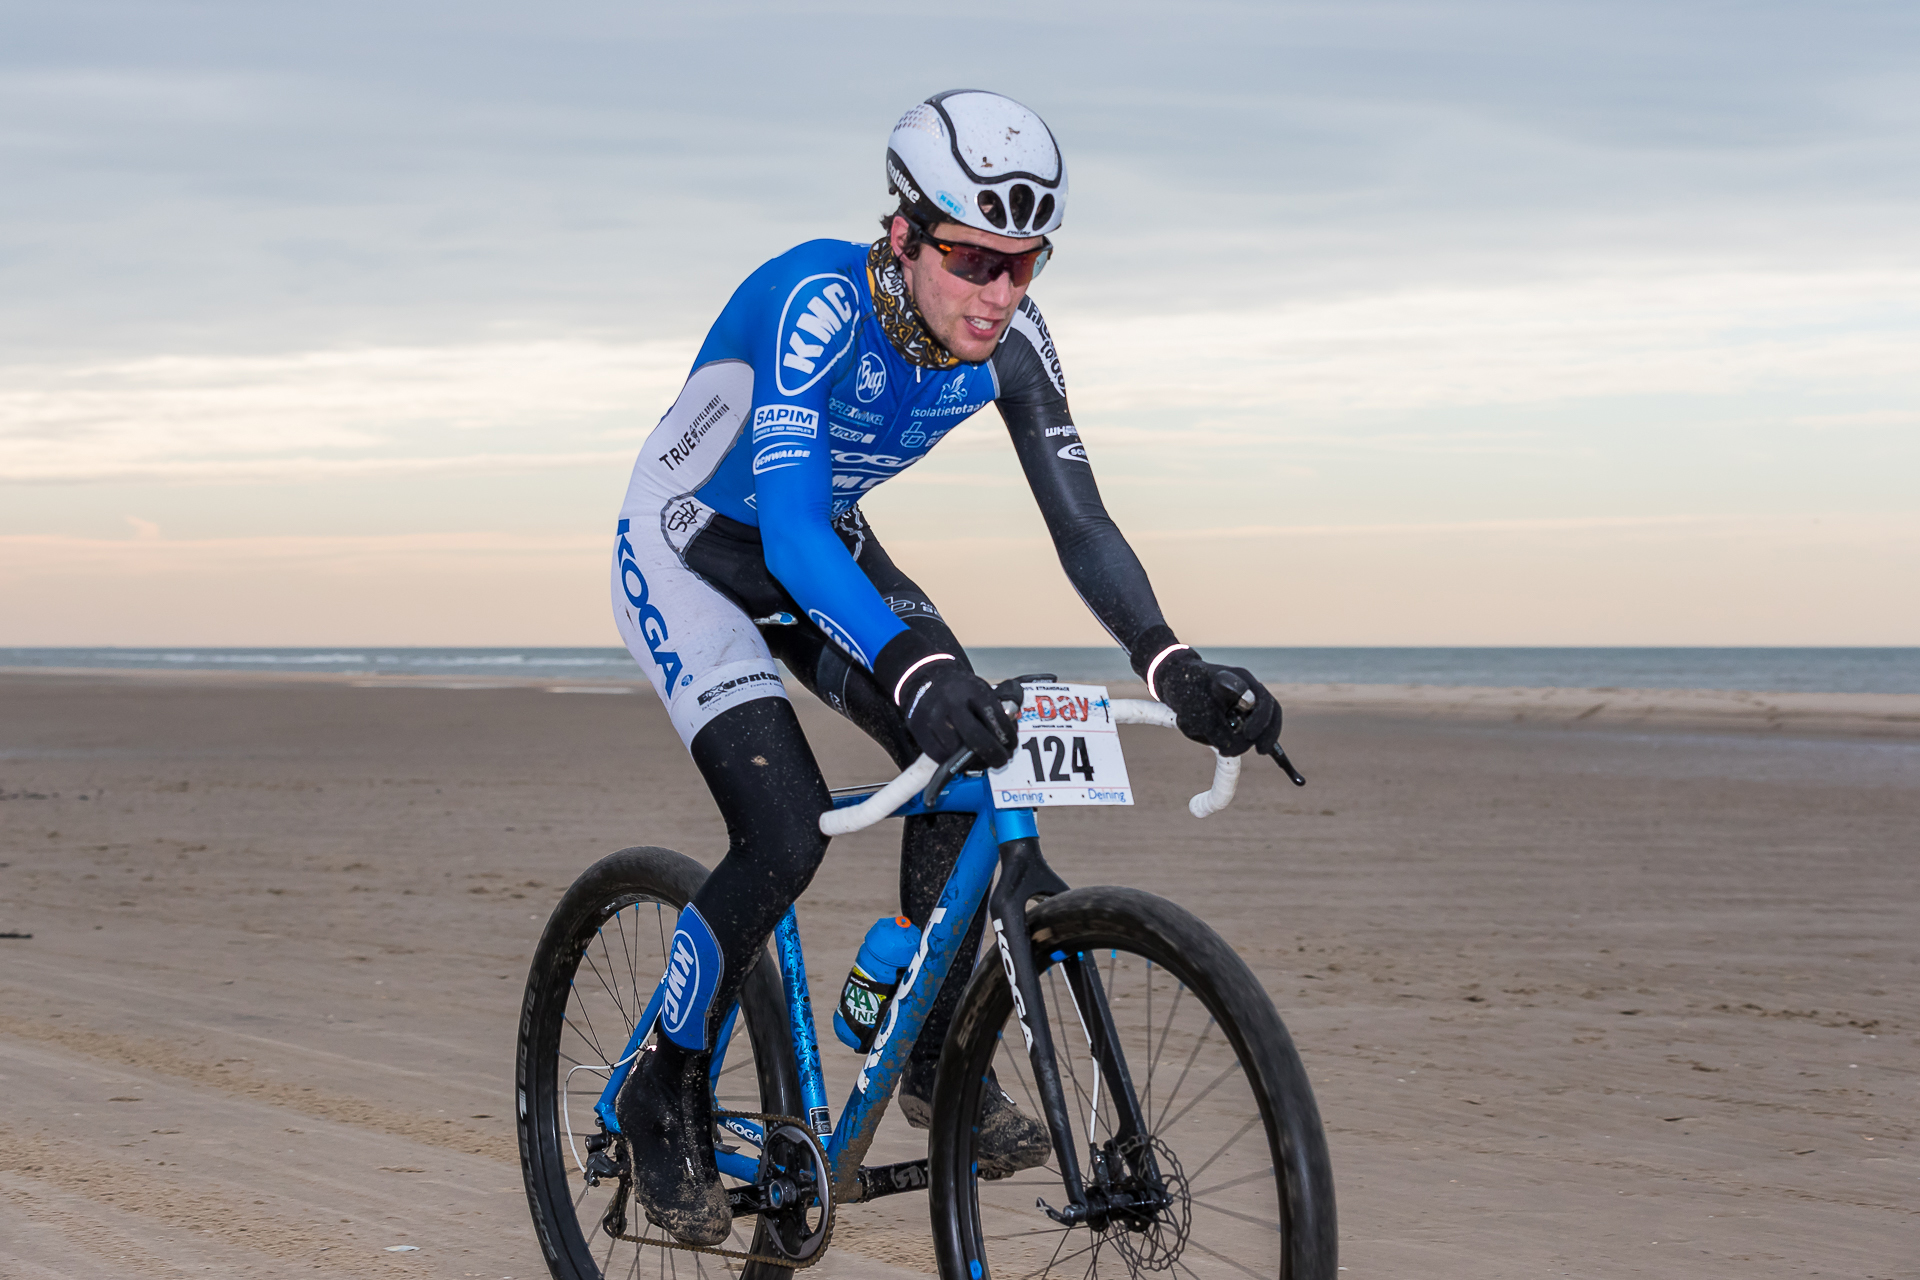 Stefan Vreugdenhil net naast het podium in strandrace